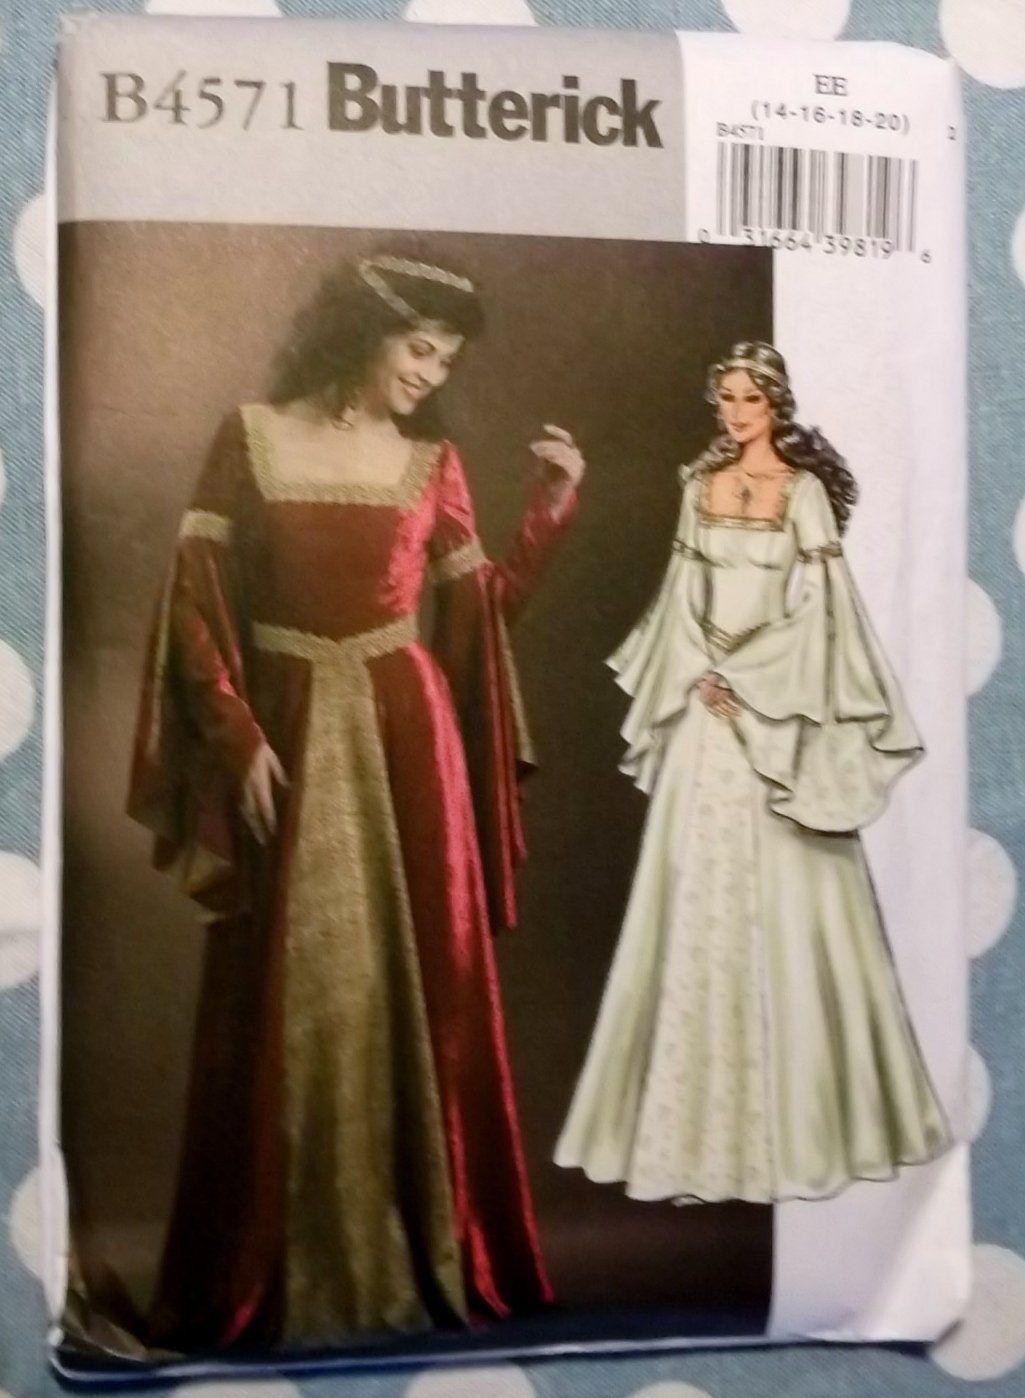 Misses+Costume+Renaissance+Dress+Butterick+B+4571+Pattern,+ ...